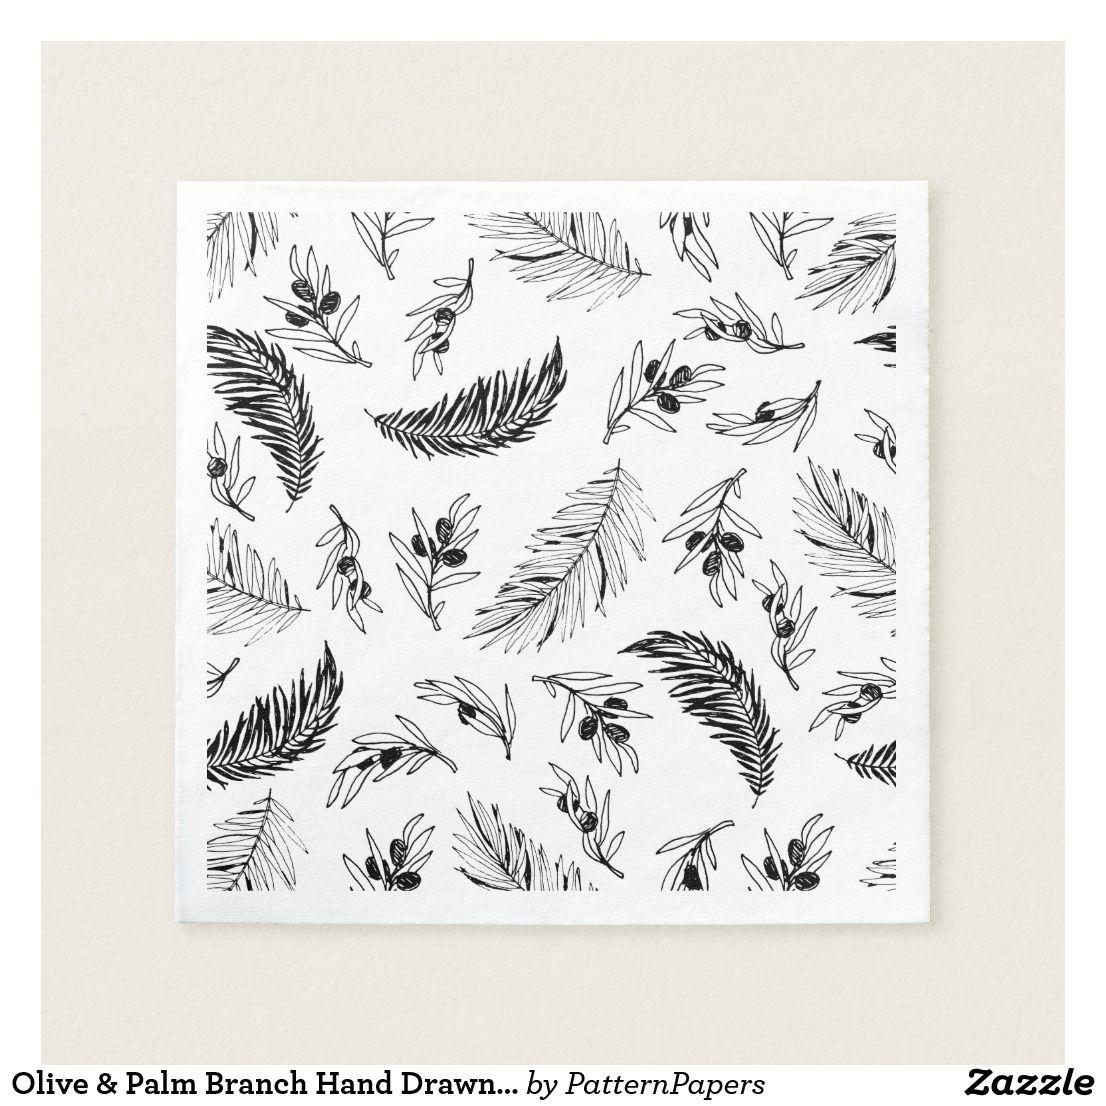 Olive Palm Branch Hand Drawn Pattern Napkin Patterned Napkins Hand Drawn Pattern Christmas Paper Napkins